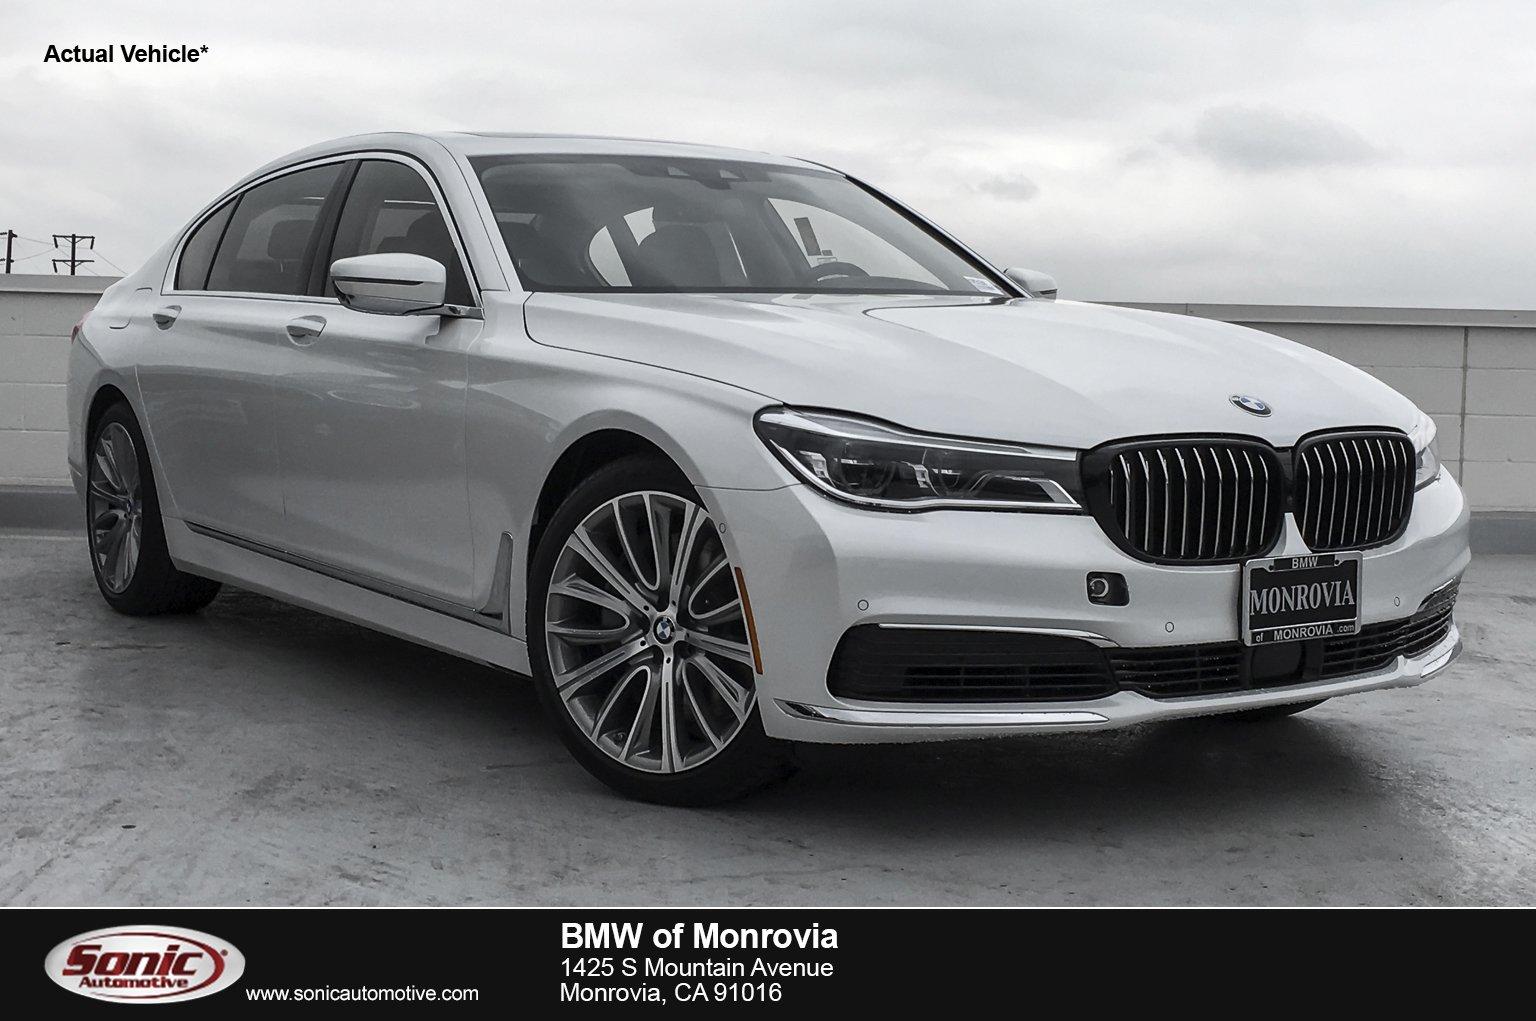 Monrovia Bmw >> New Featured BMW Vehicles in Monrovia, CA